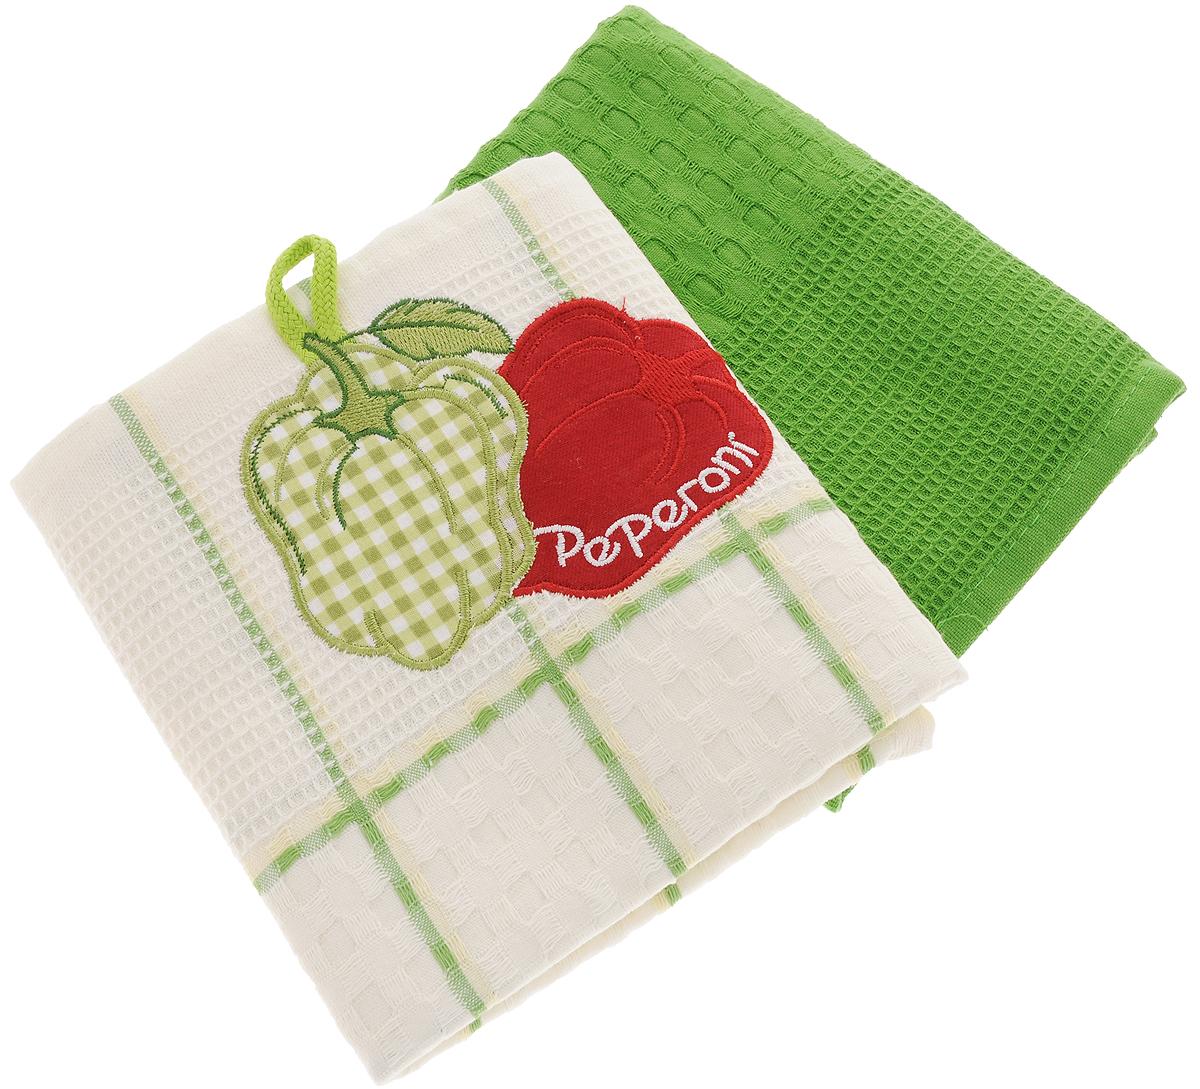 "Набор кухонных полотенец Bonita ""Перец"", цвет: зеленый, белый, 45 х 70 см, 2 шт"